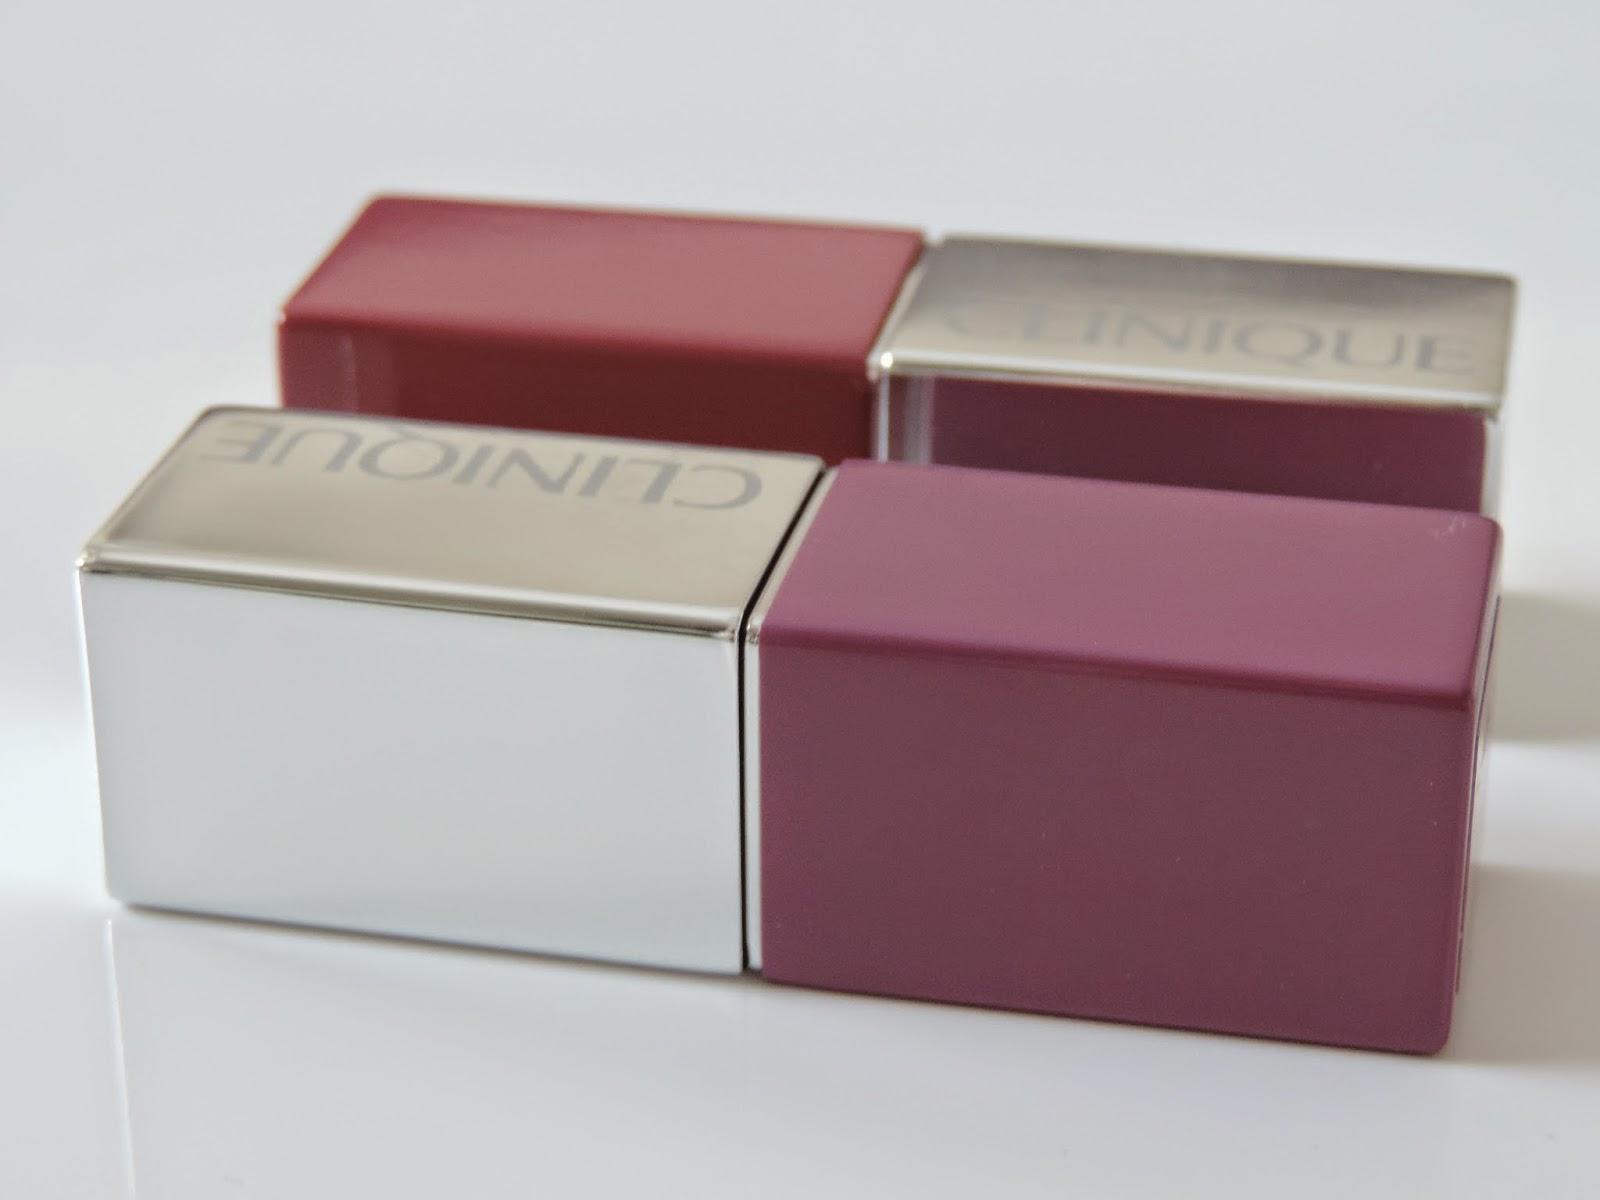 Clinique Pop Lip Colour and Primer